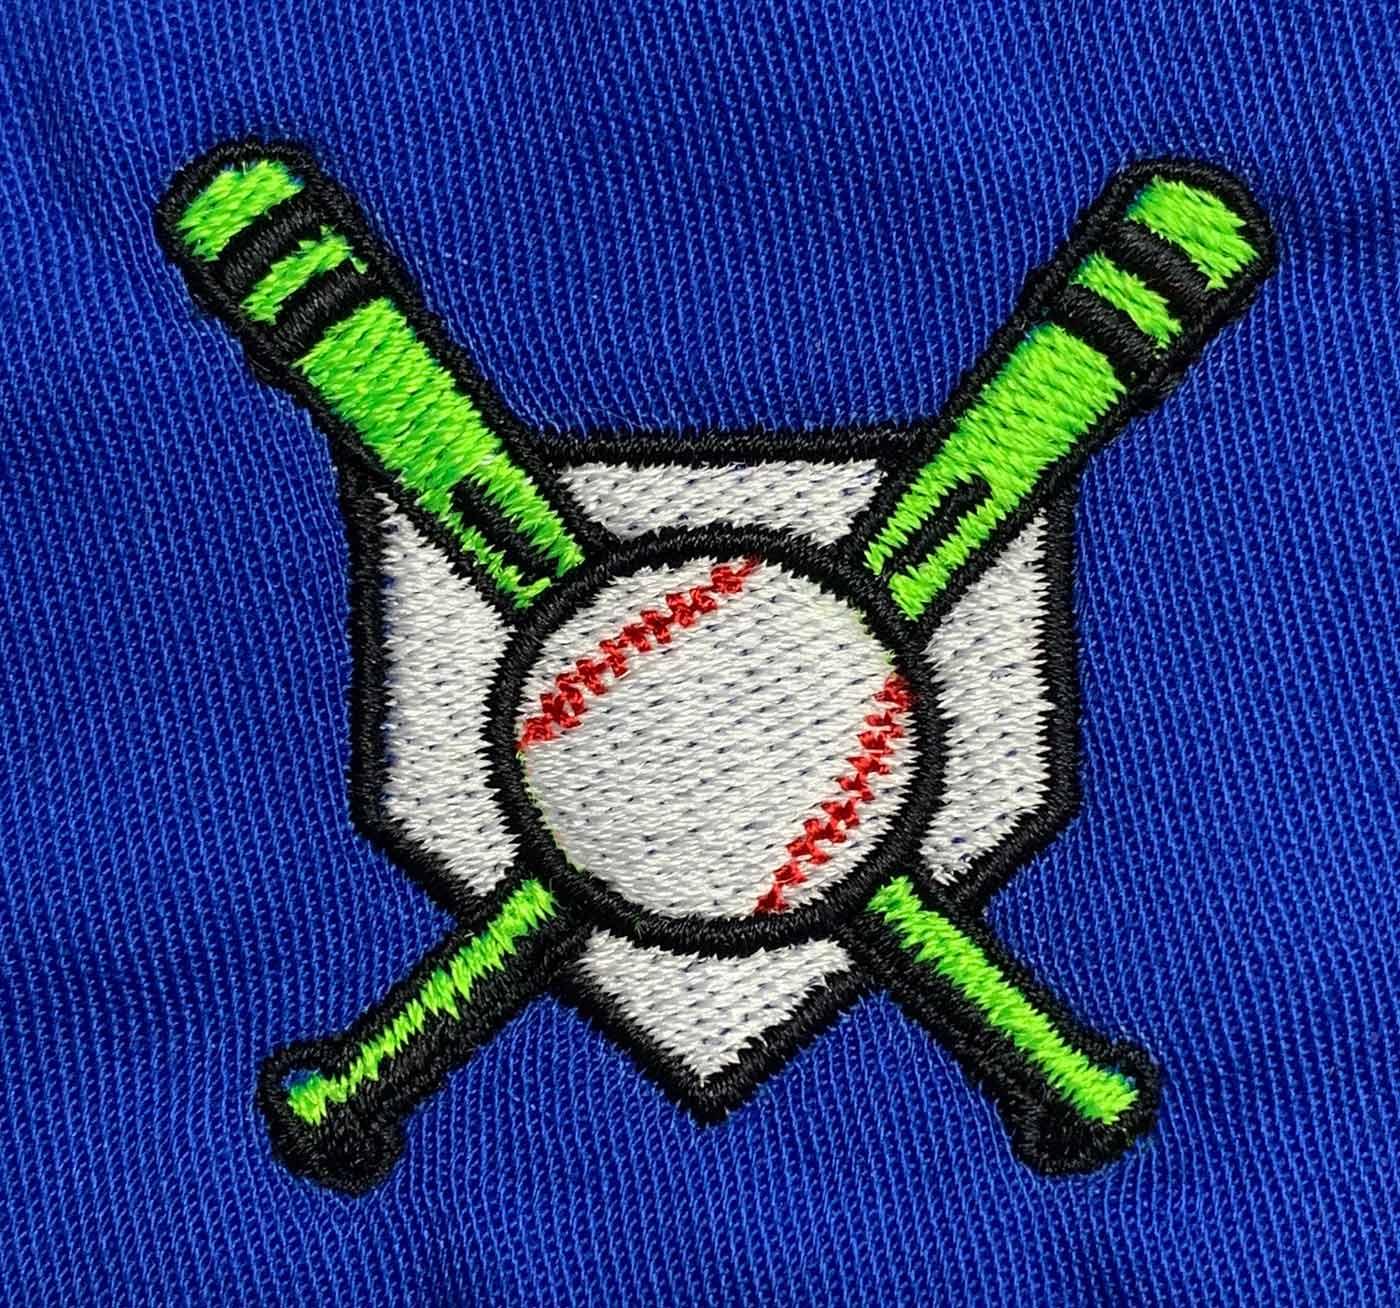 KYC_BASEBALL-BATS,-BALL-&-DIAMOND_web.jpg